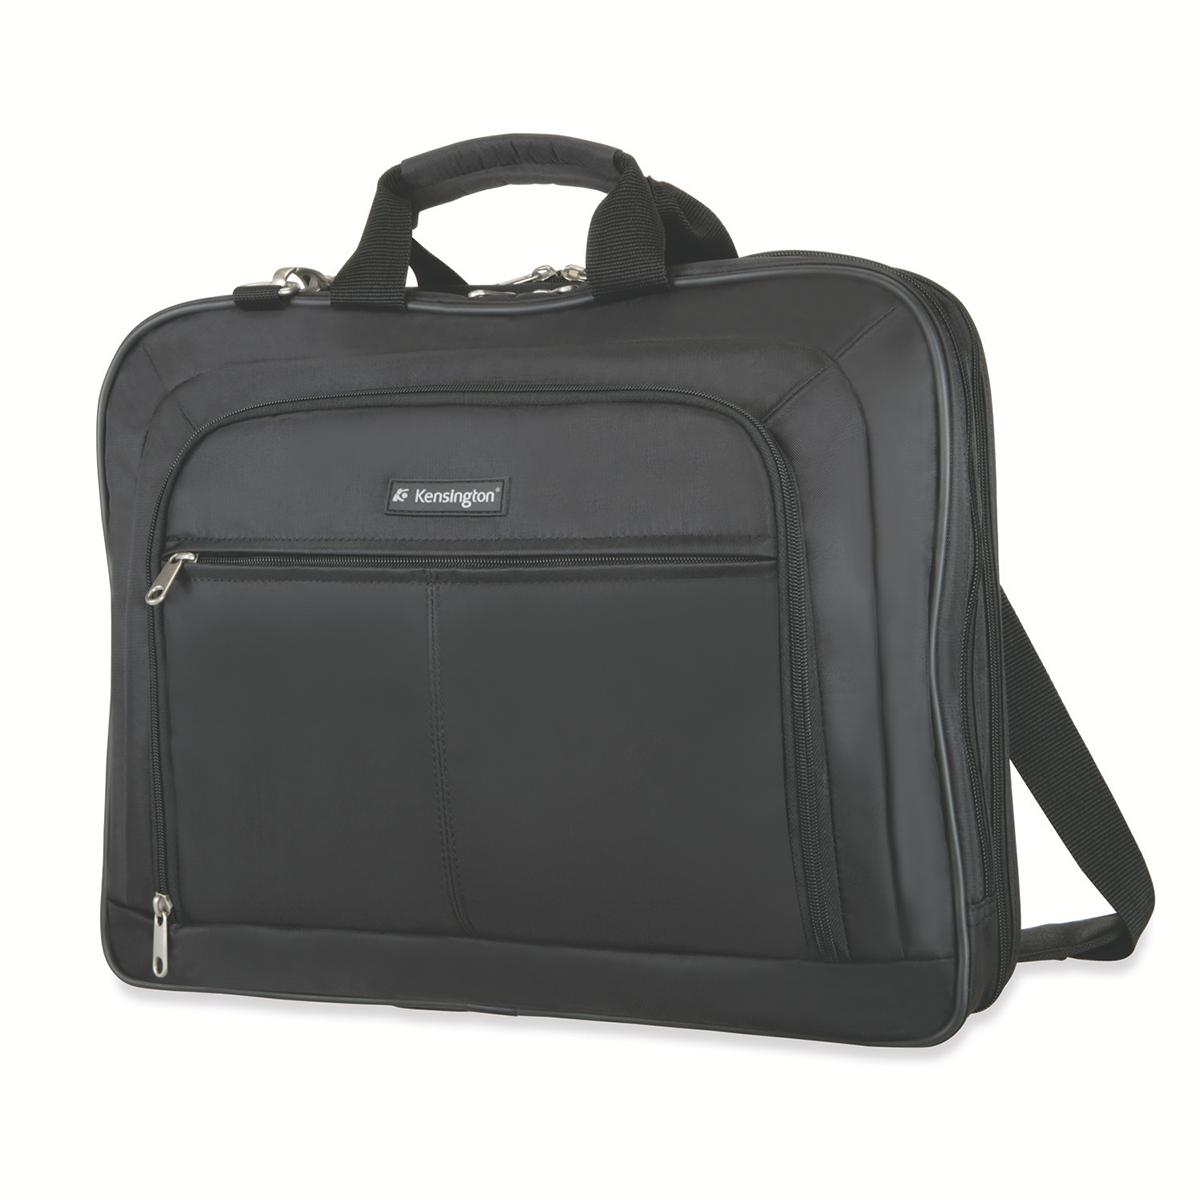 Kensington  K62568US SP45 17 Inch Classic Topload Case